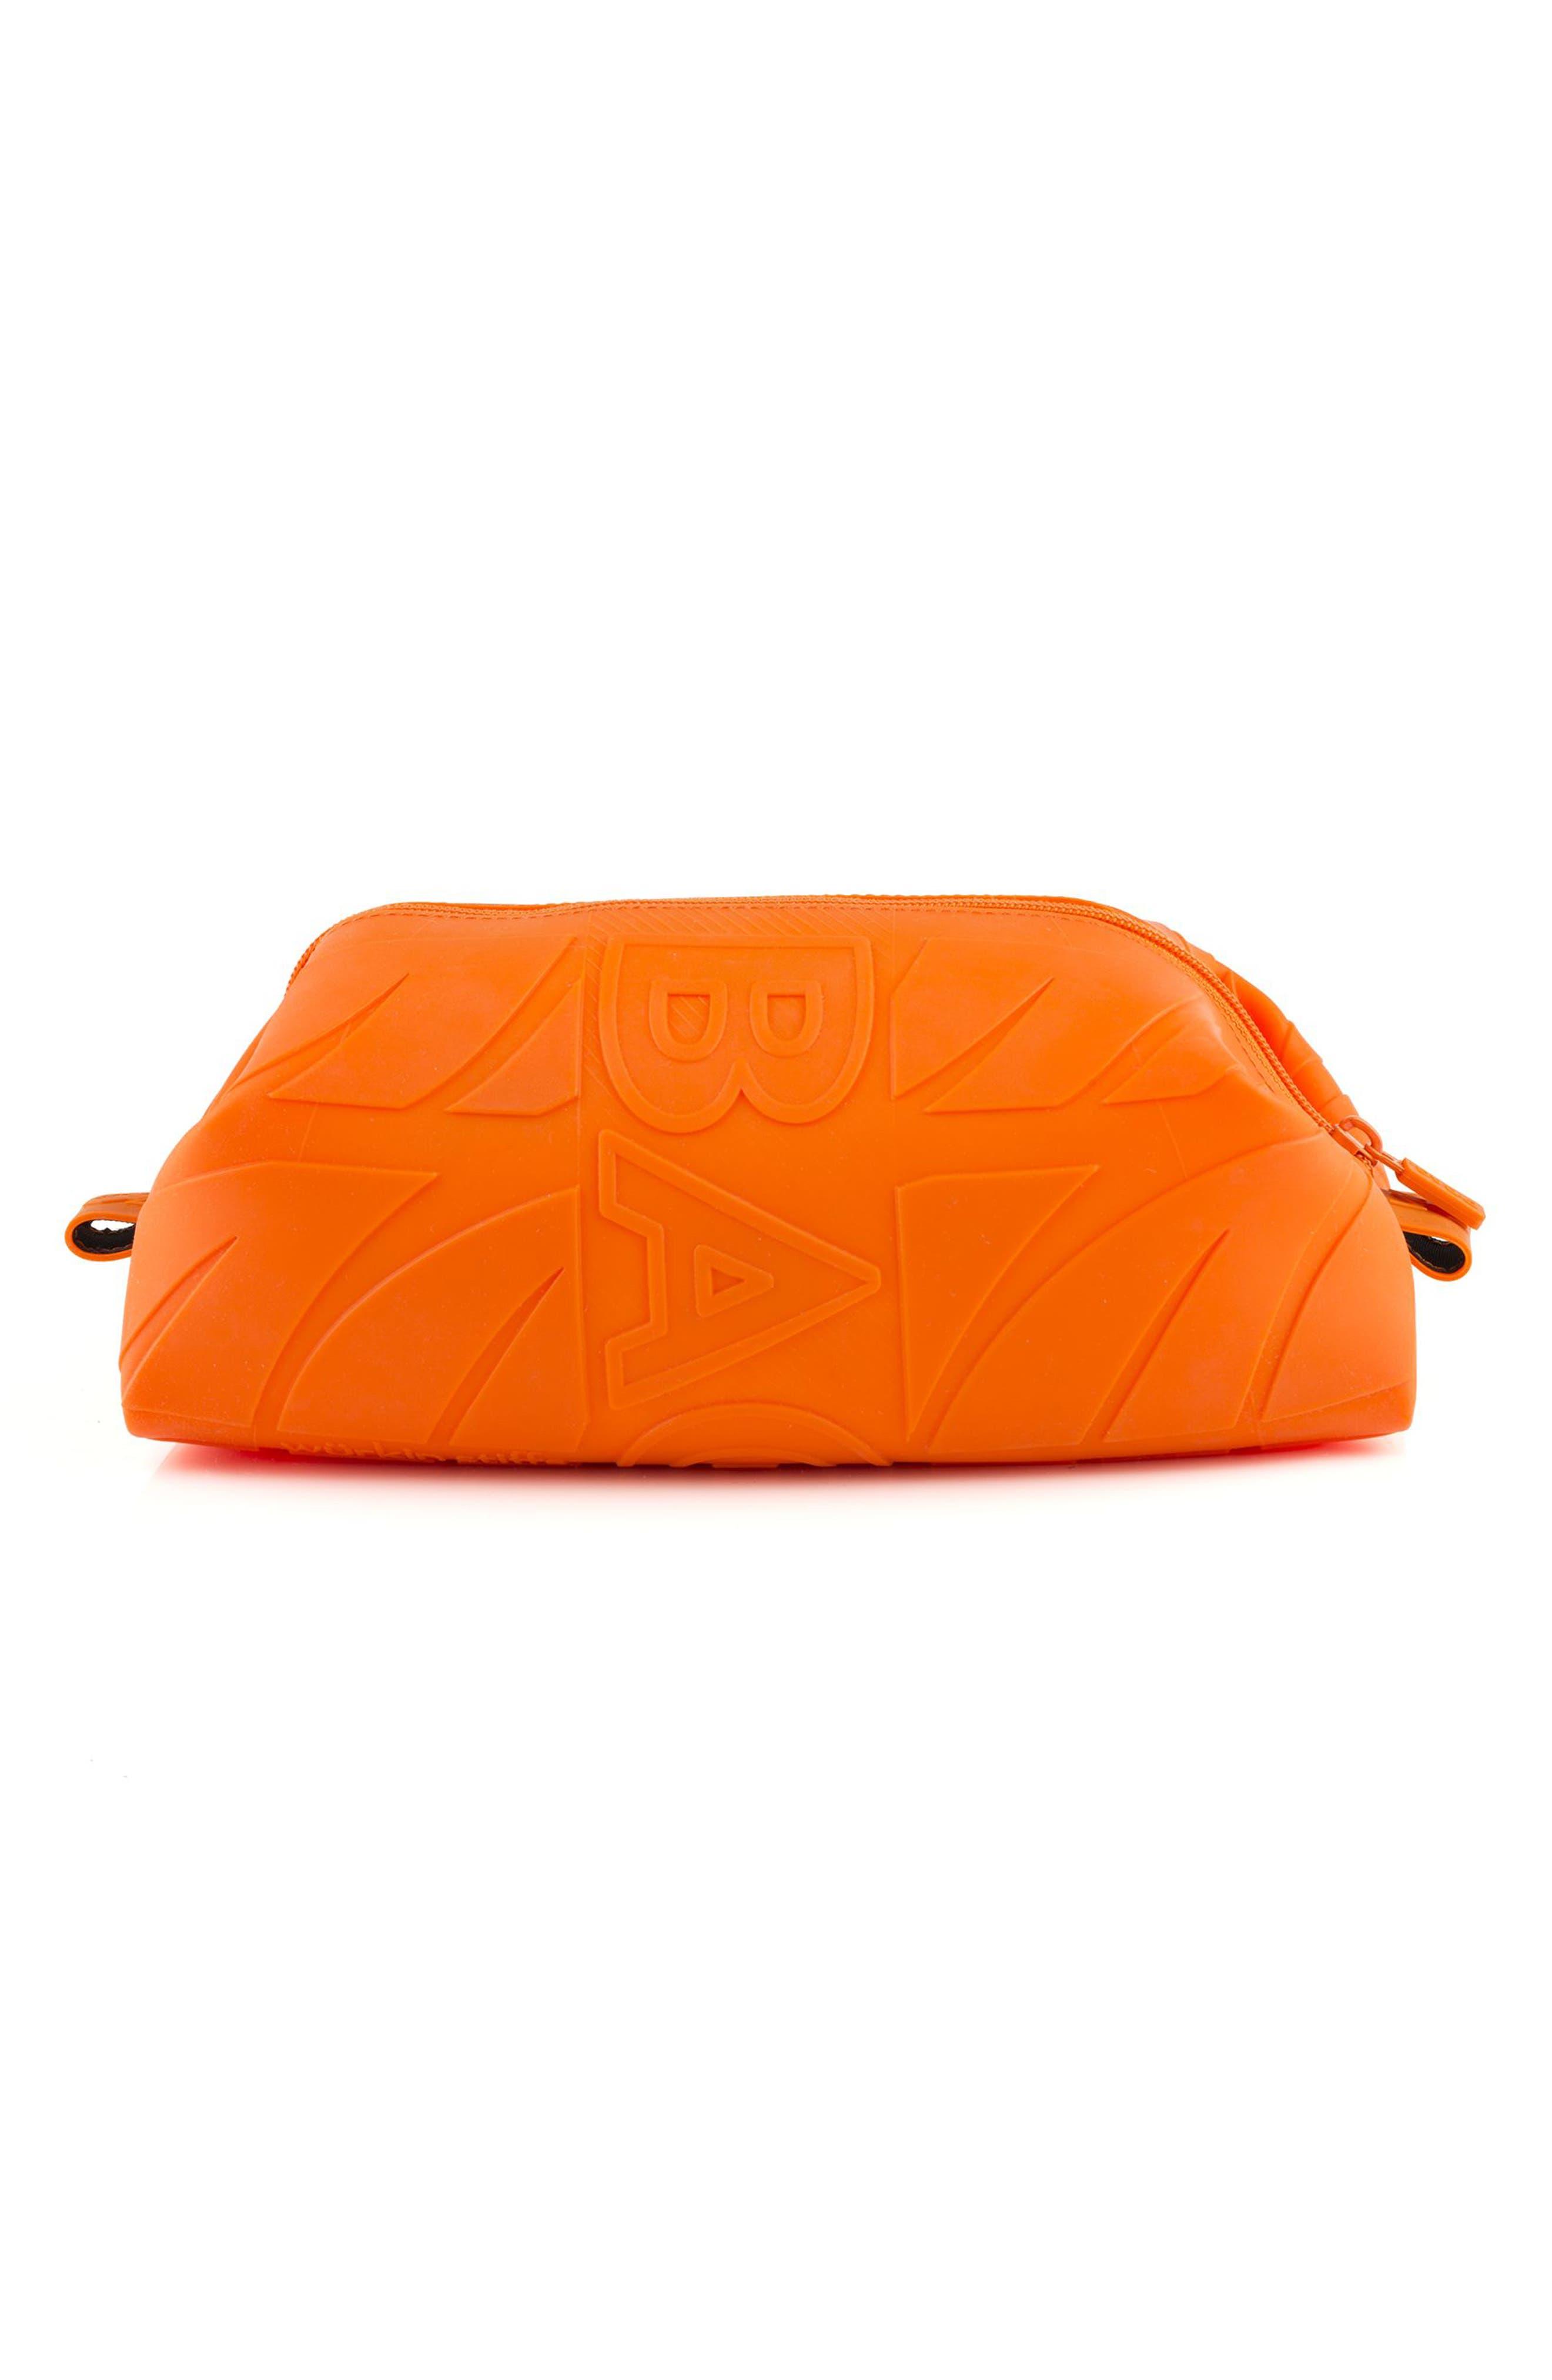 Silicone Travel Kit,                         Main,                         color, Orange